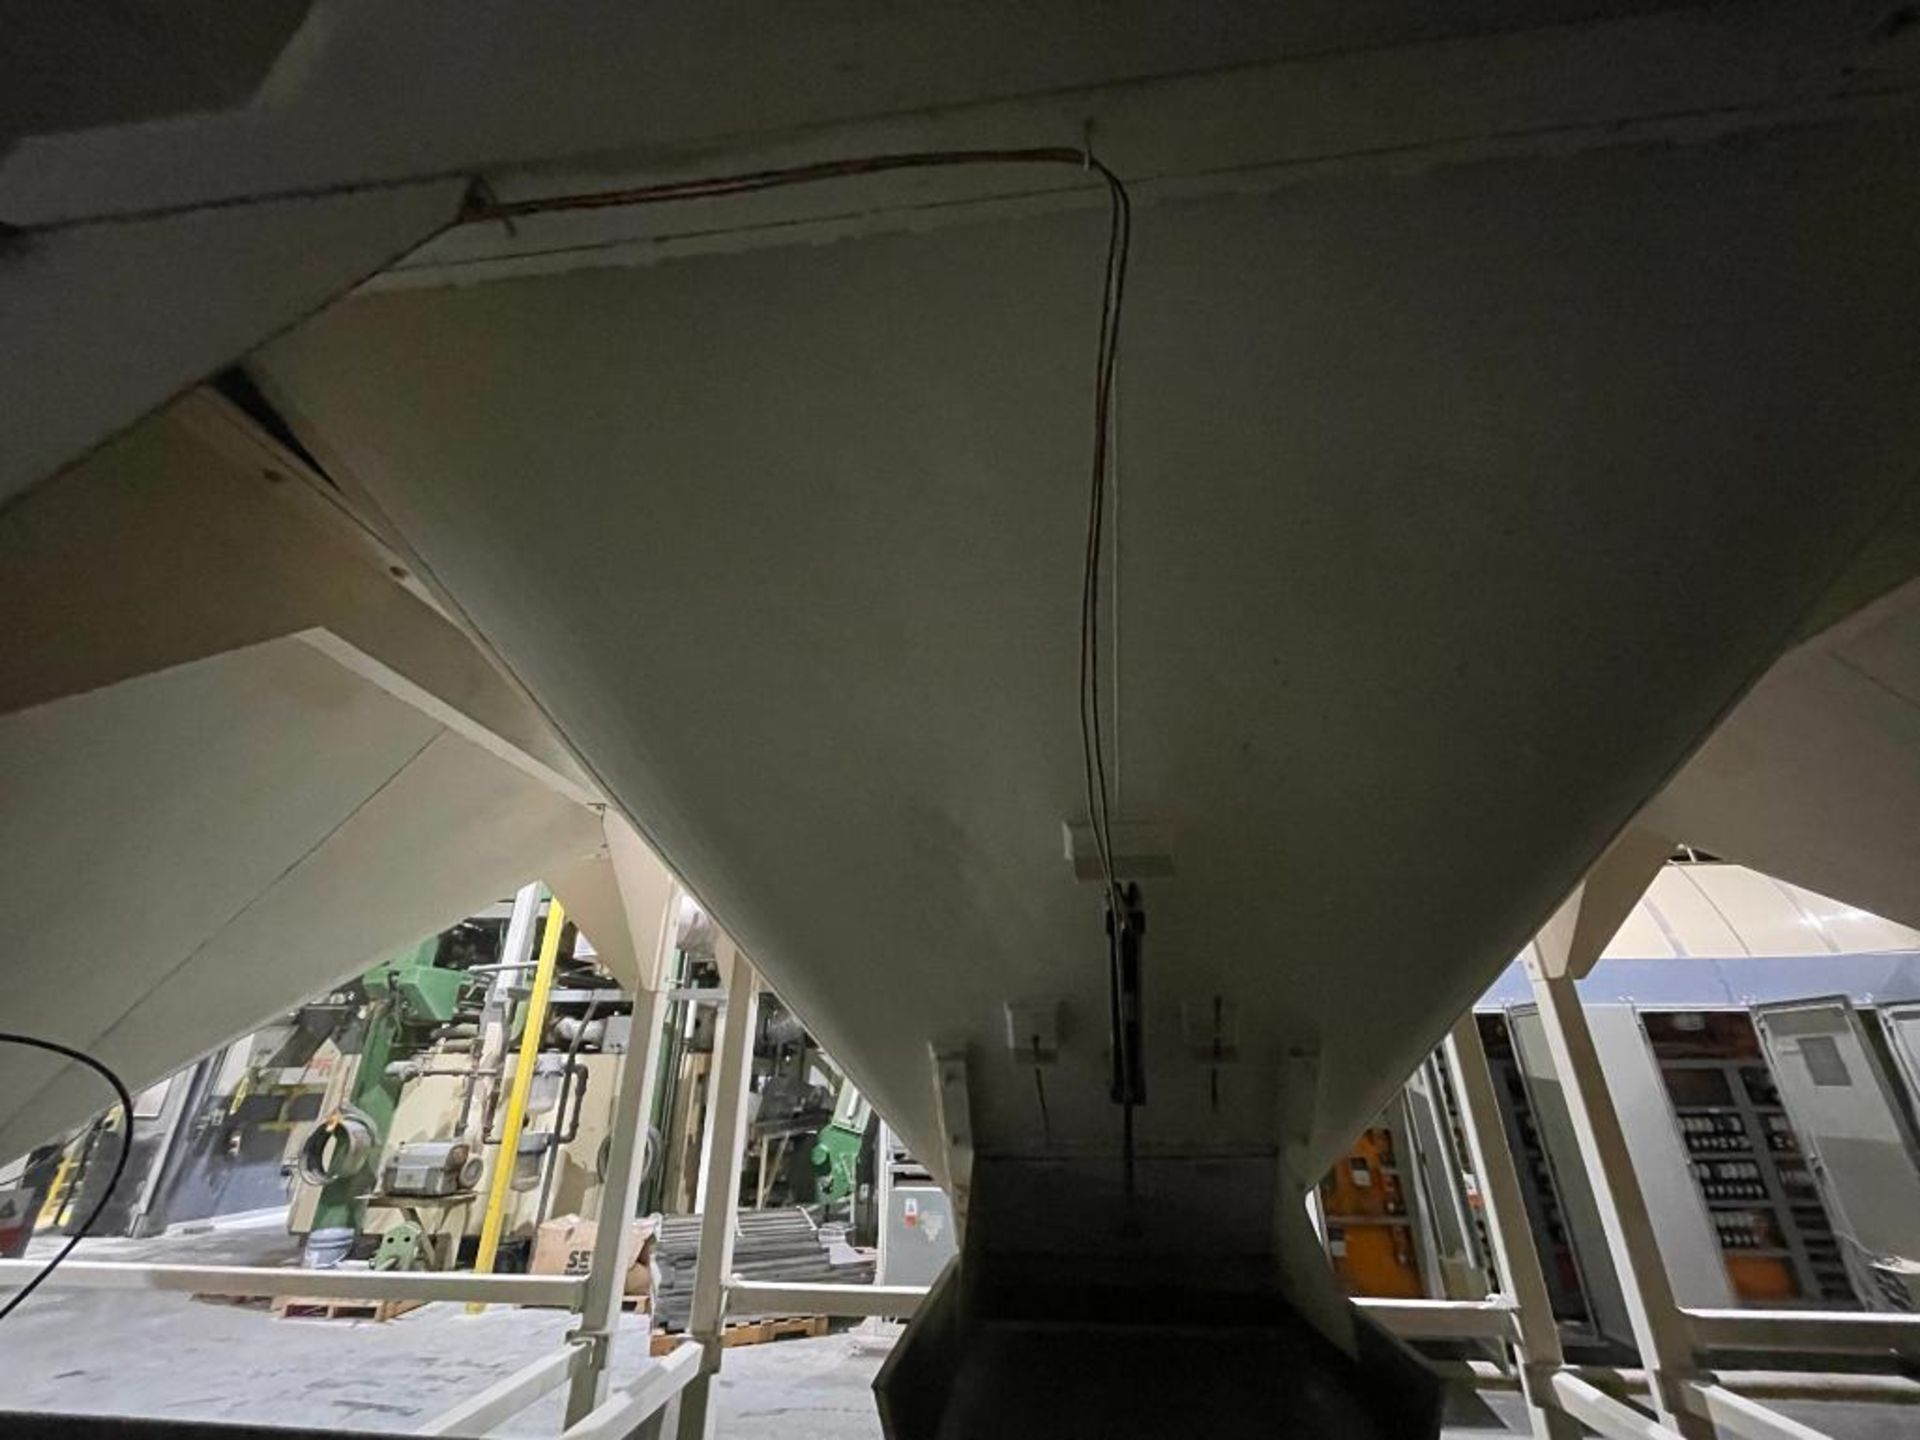 Aseeco mild steel cone bottom bulk storage bin - Image 22 of 31